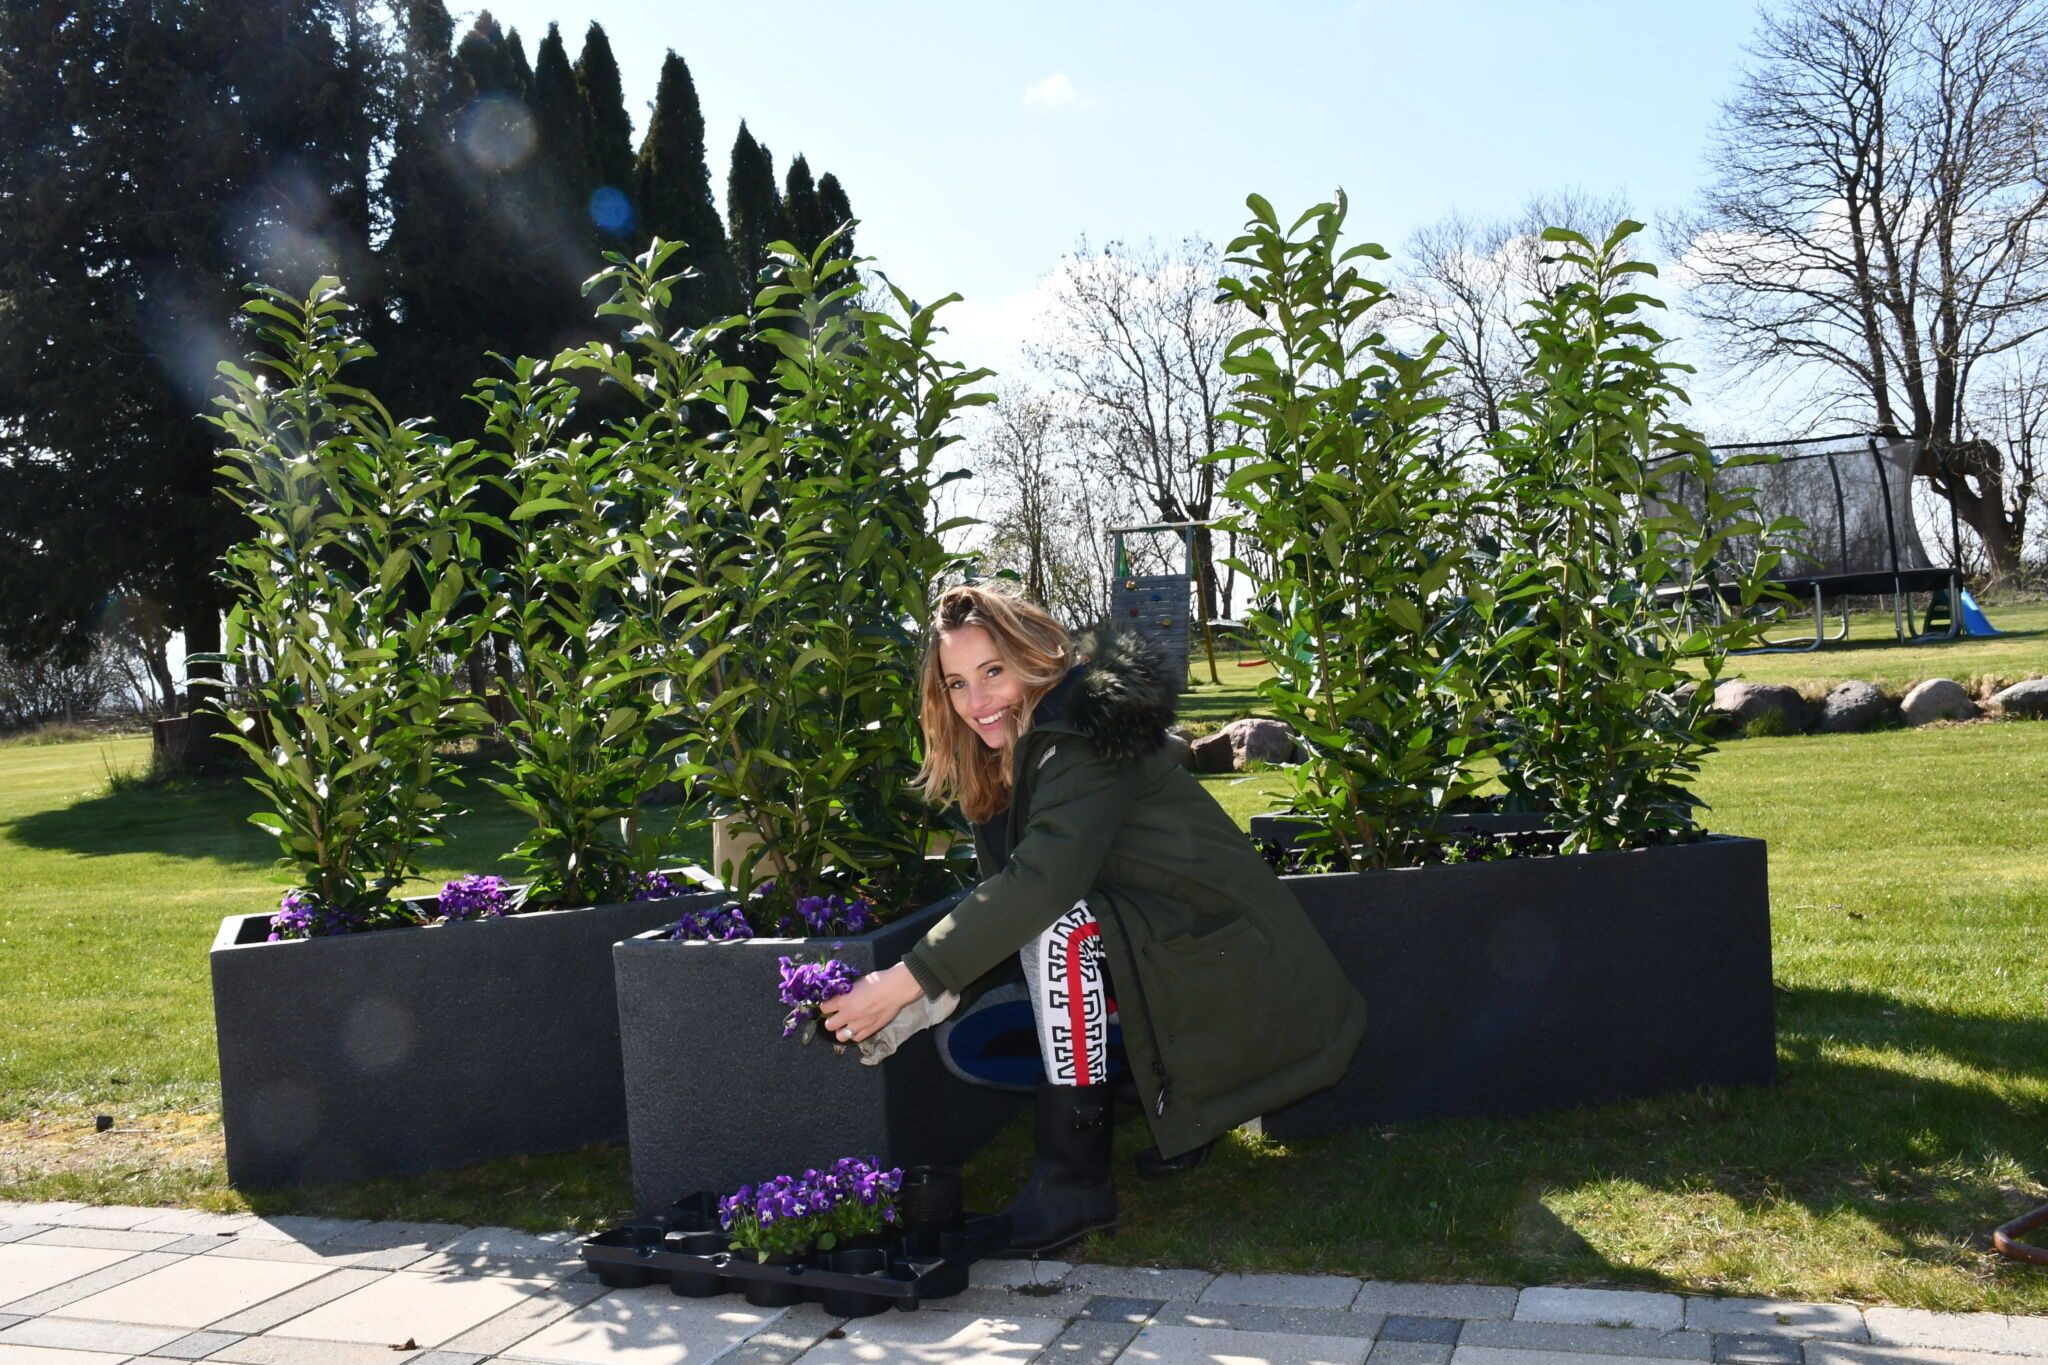 anchers havecenter terrasse beplantning 6